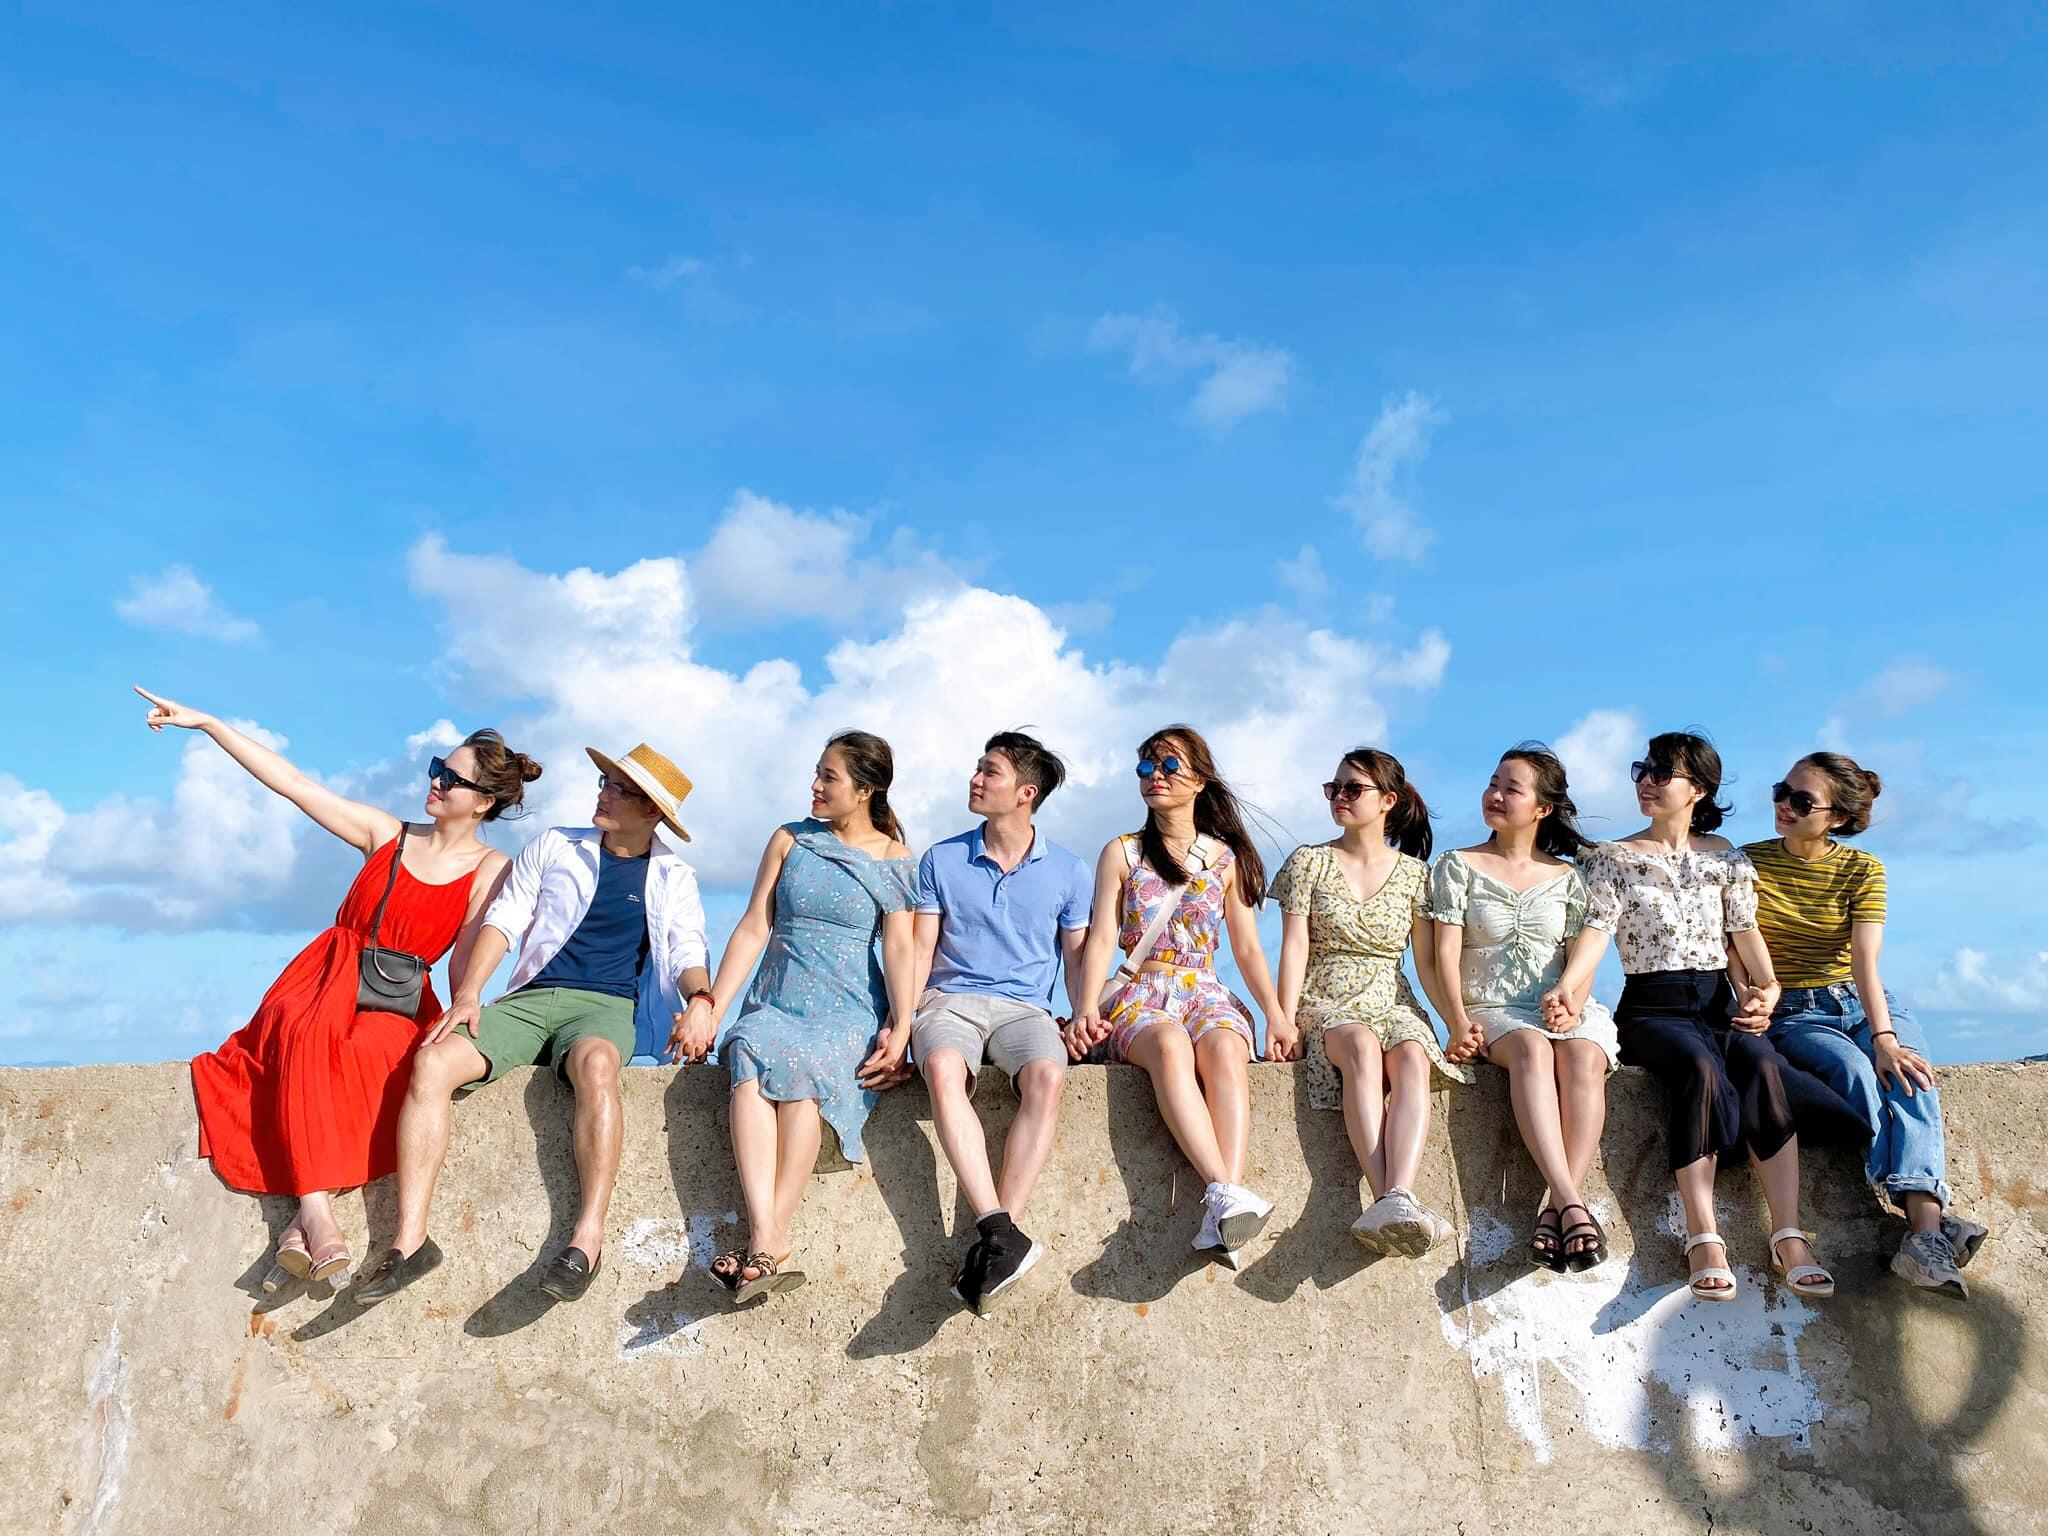 xung-xinh-checkin-nhung-bai-tam-dep-o-co-to-vietmountain-travel8